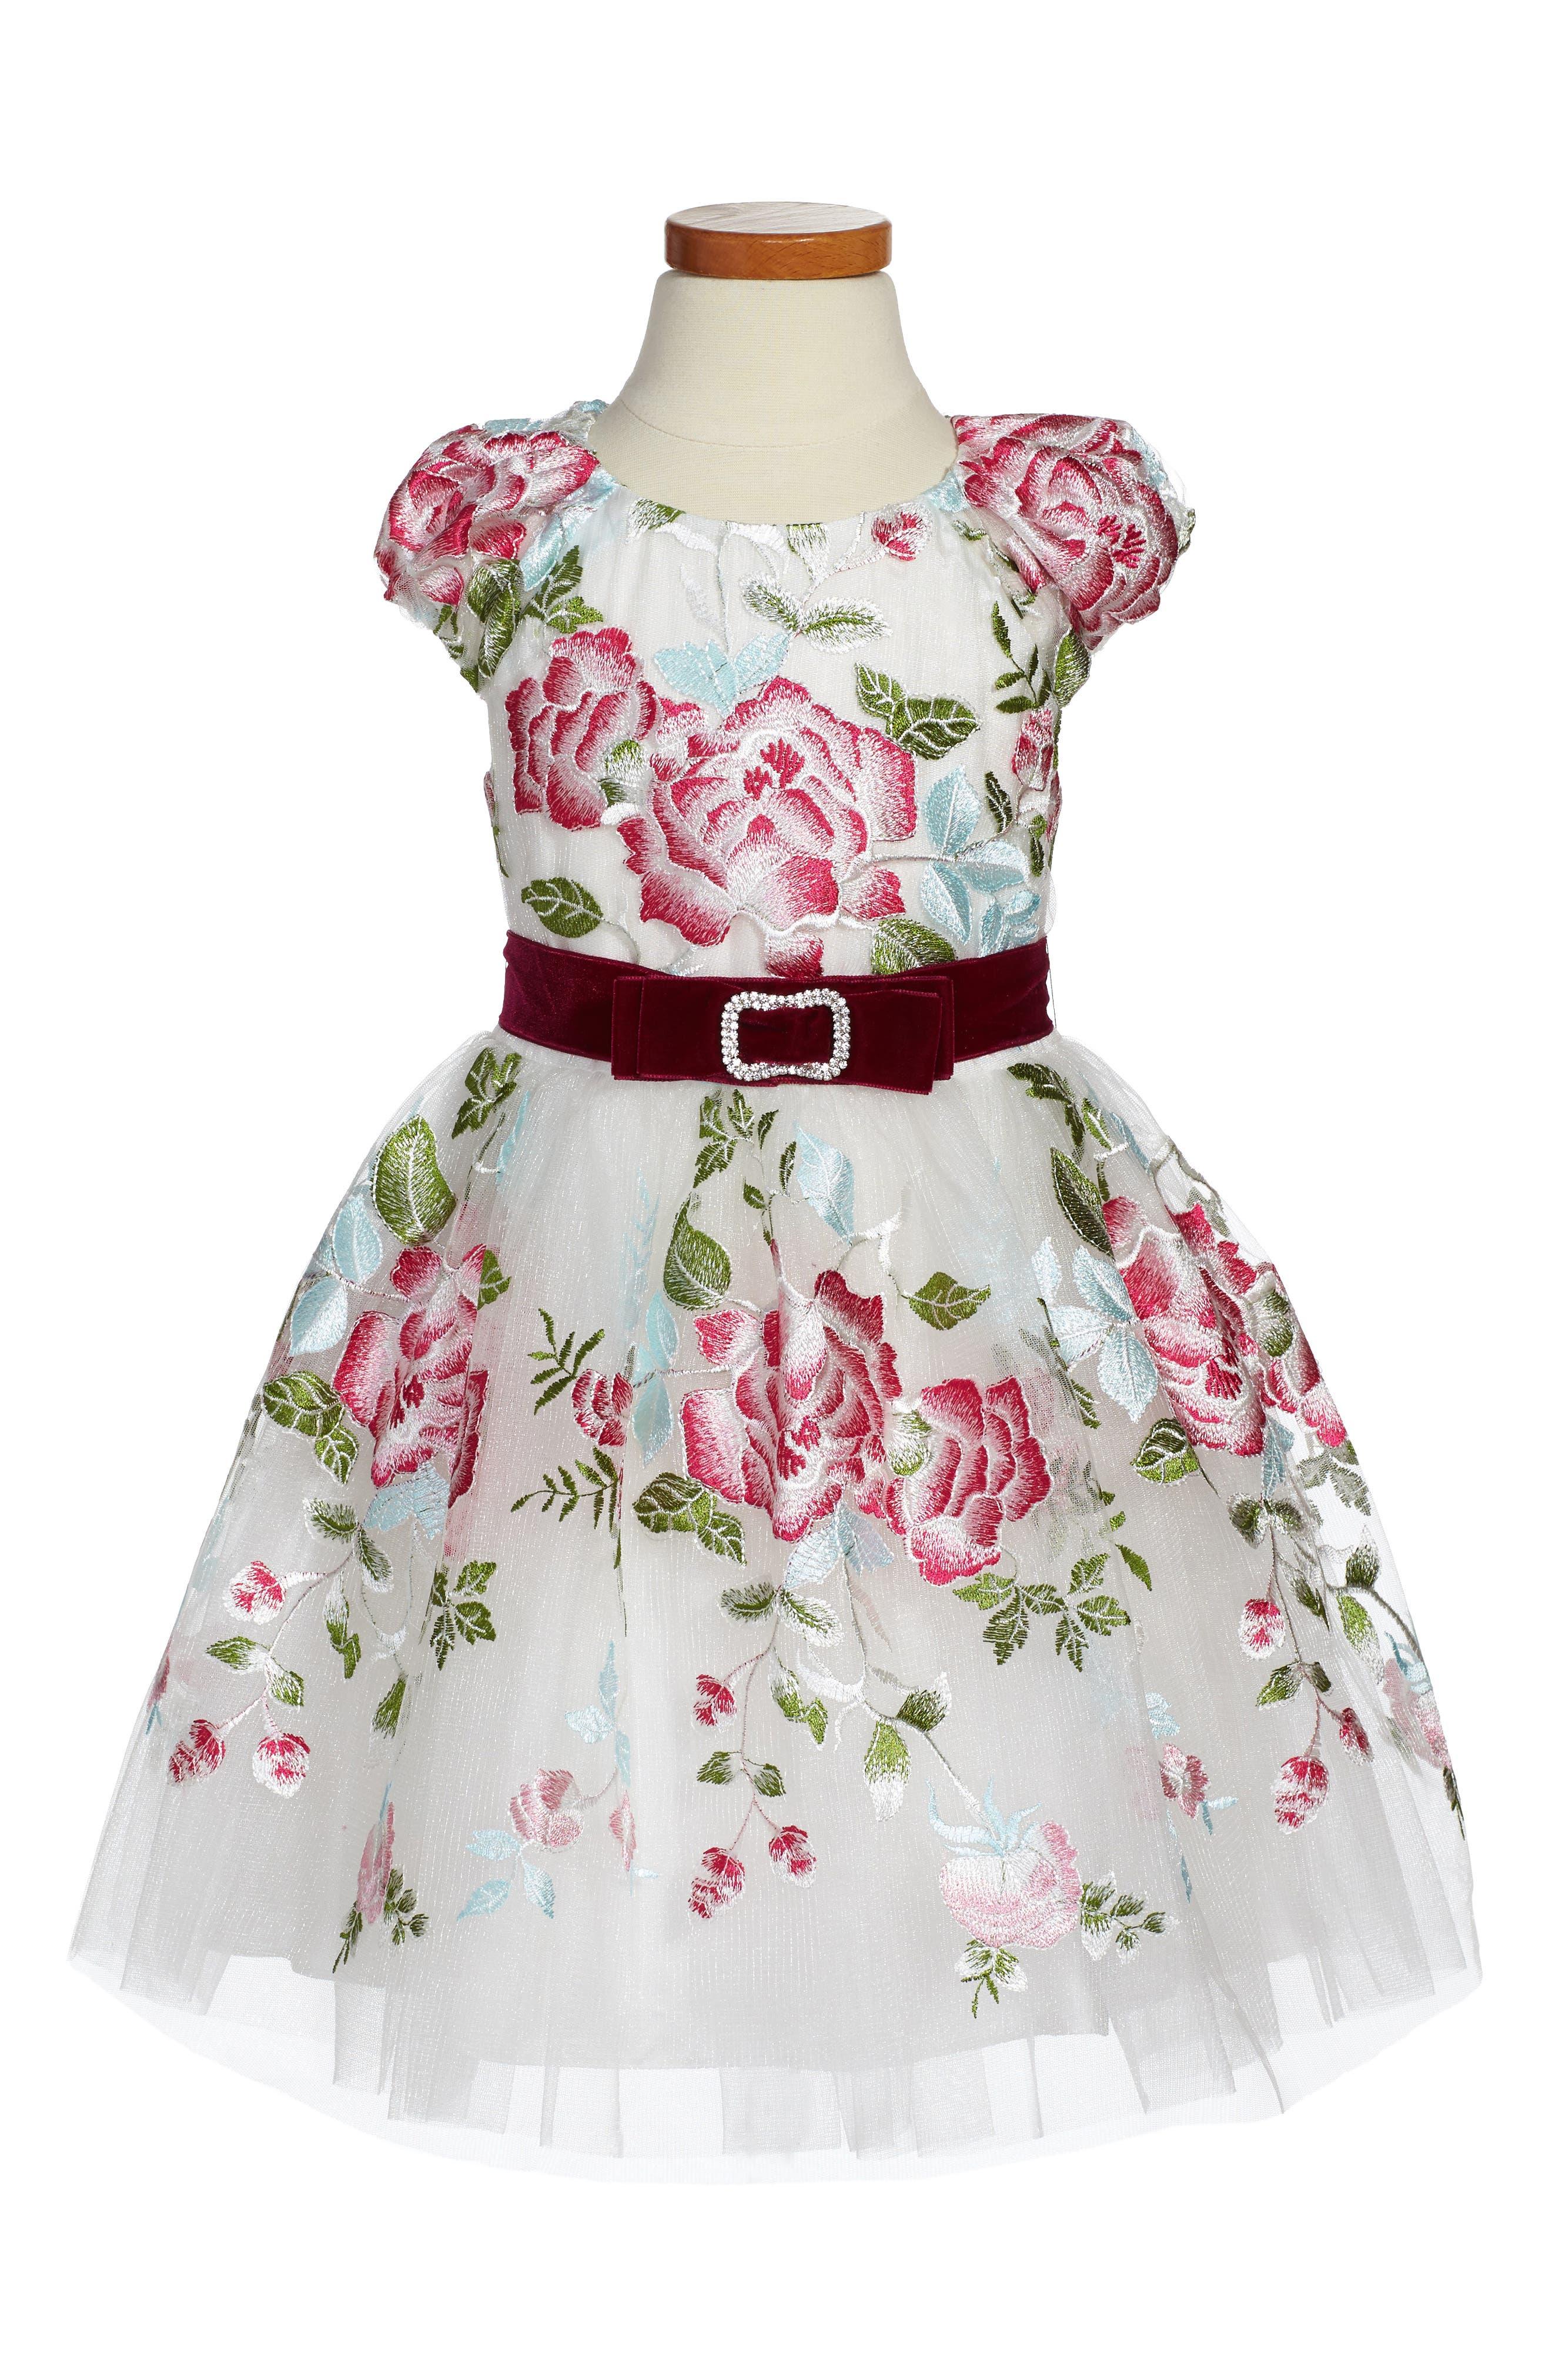 David Charles Rose Embroidered Tulle Dress (Toddler Girls & Little Girls)